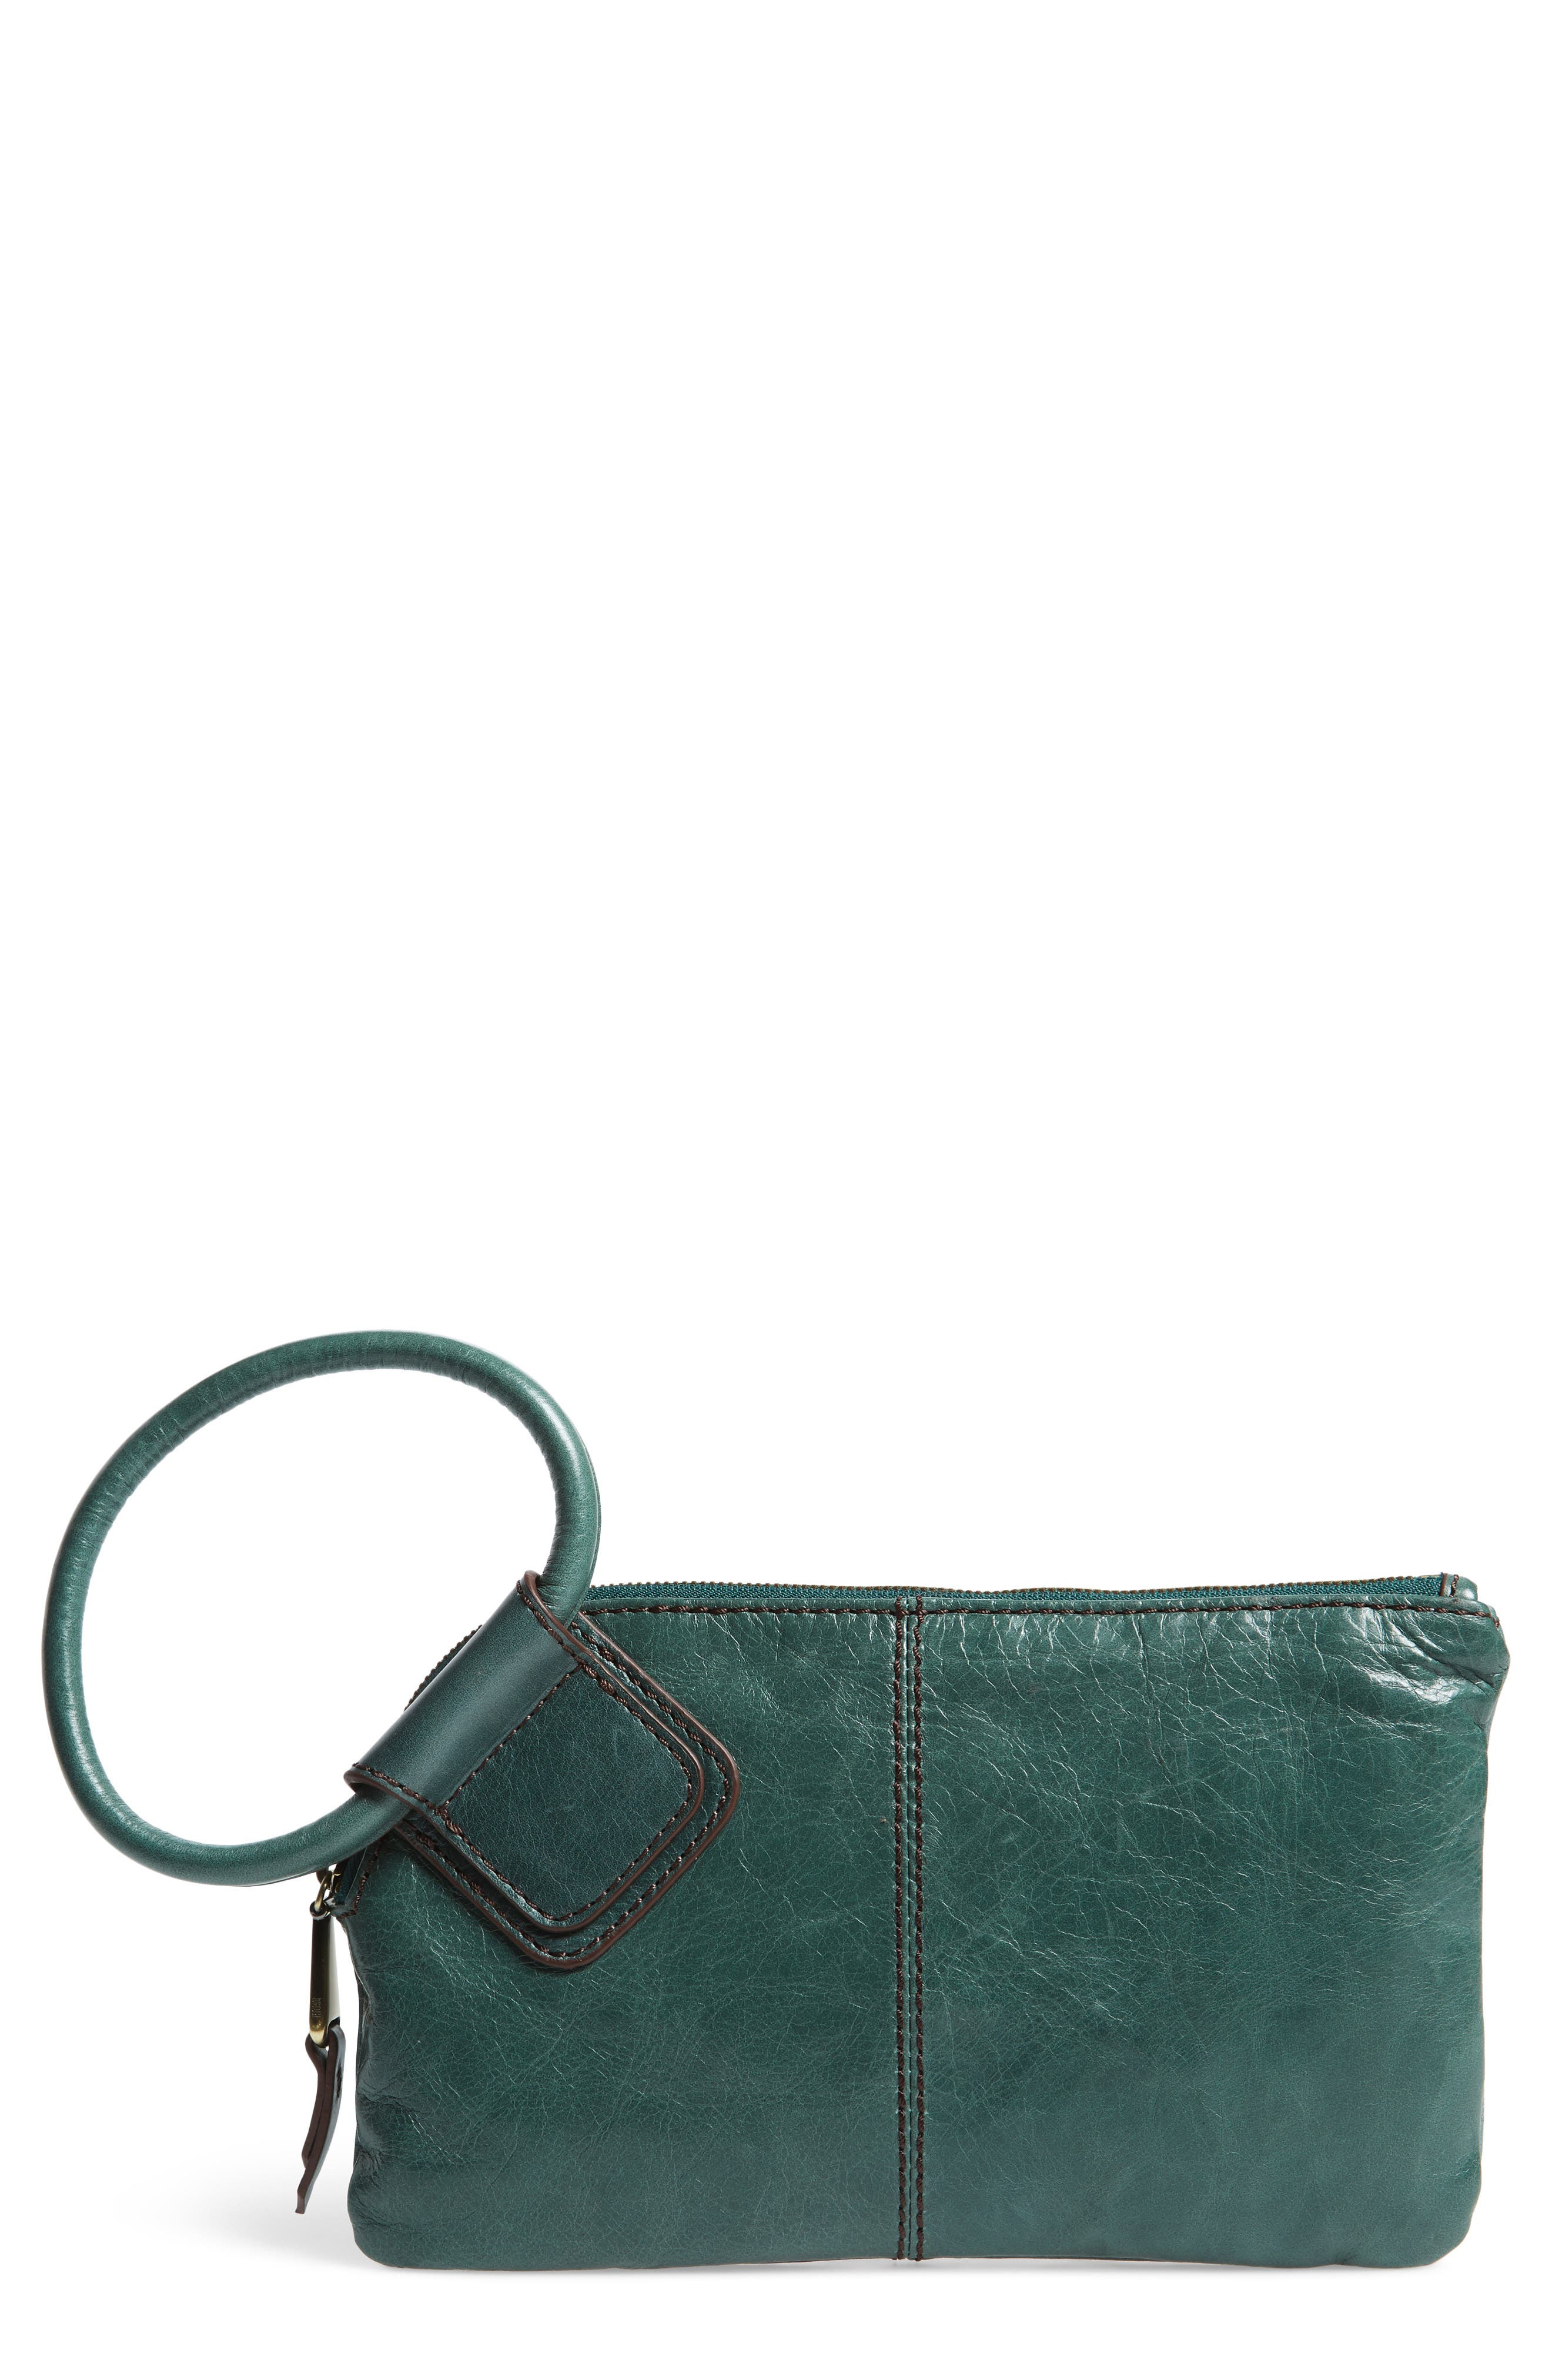 Hobo Sable Calfskin Leather Clutch